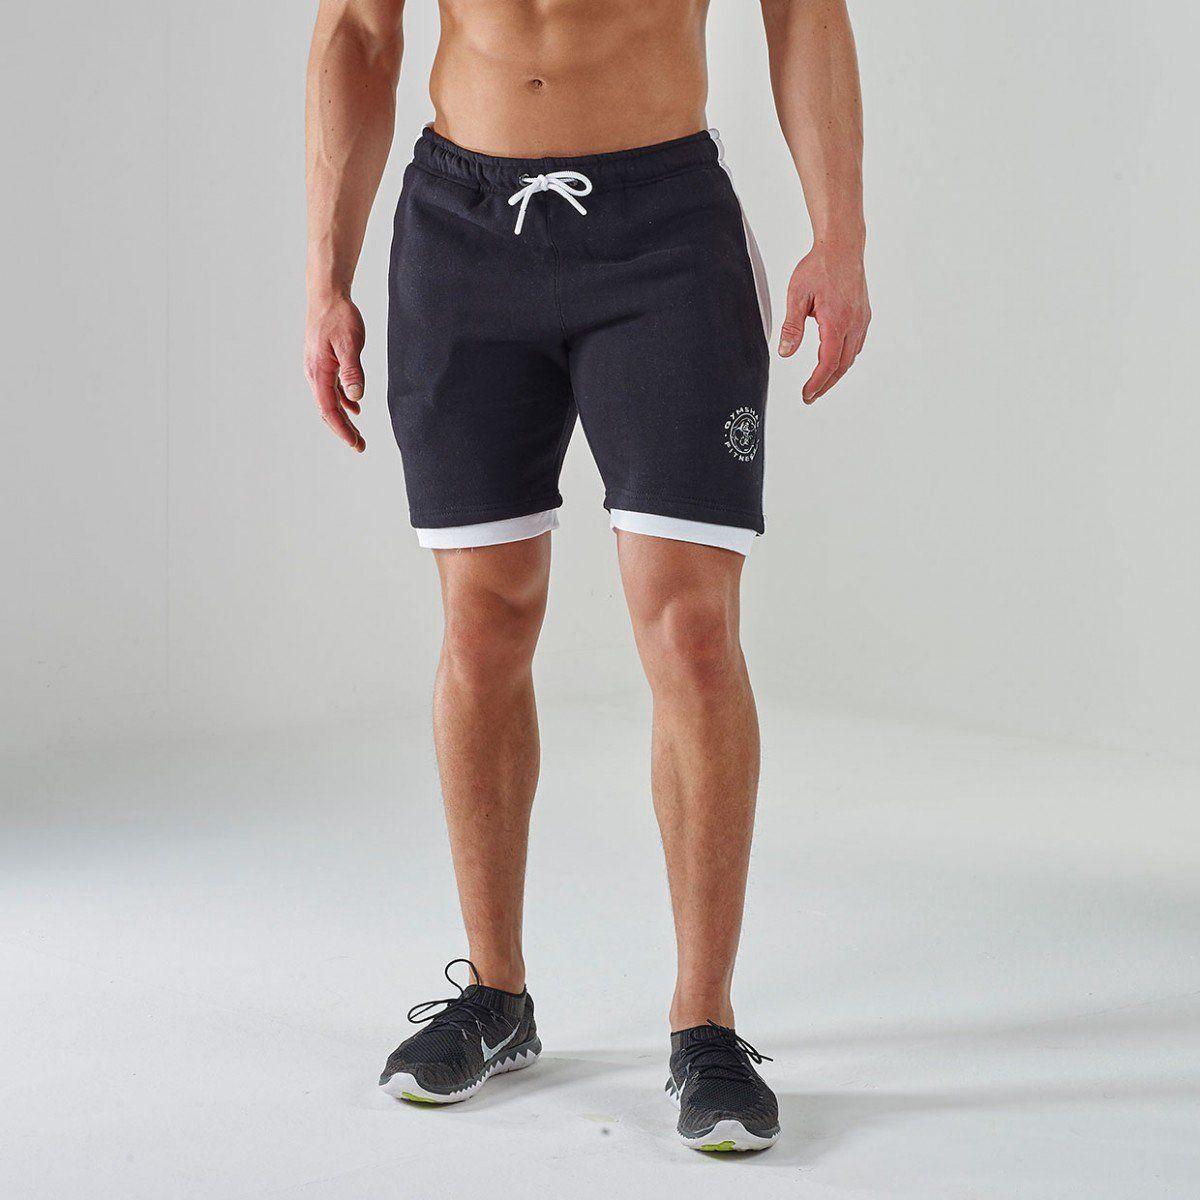 Luxe Legacy Fitness Shorts | Gym Shorts | Black / White | Gymshark